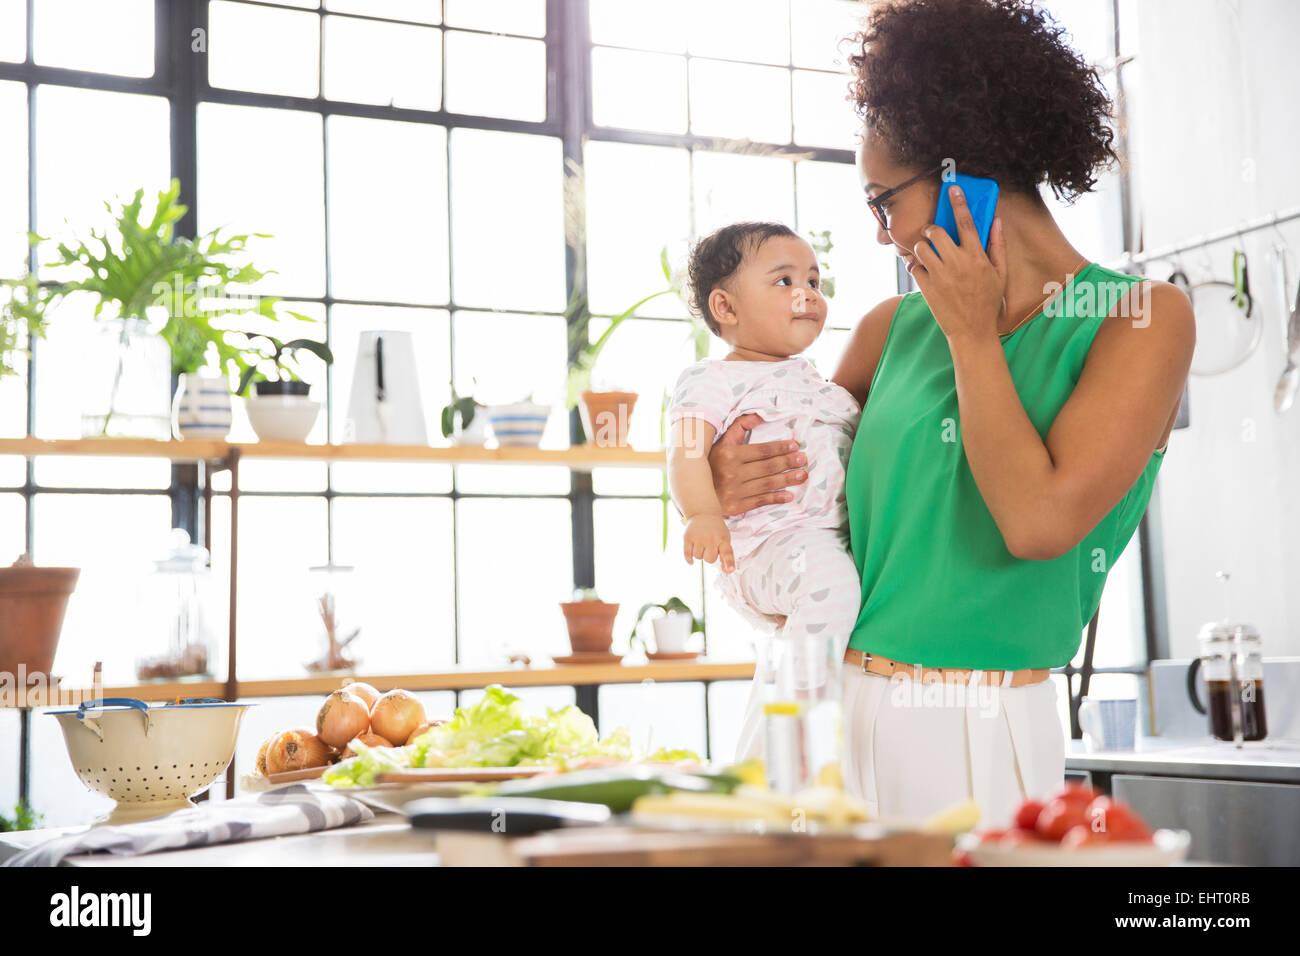 Mom Multitasking Kitchen Stock Photos & Mom Multitasking Kitchen ...